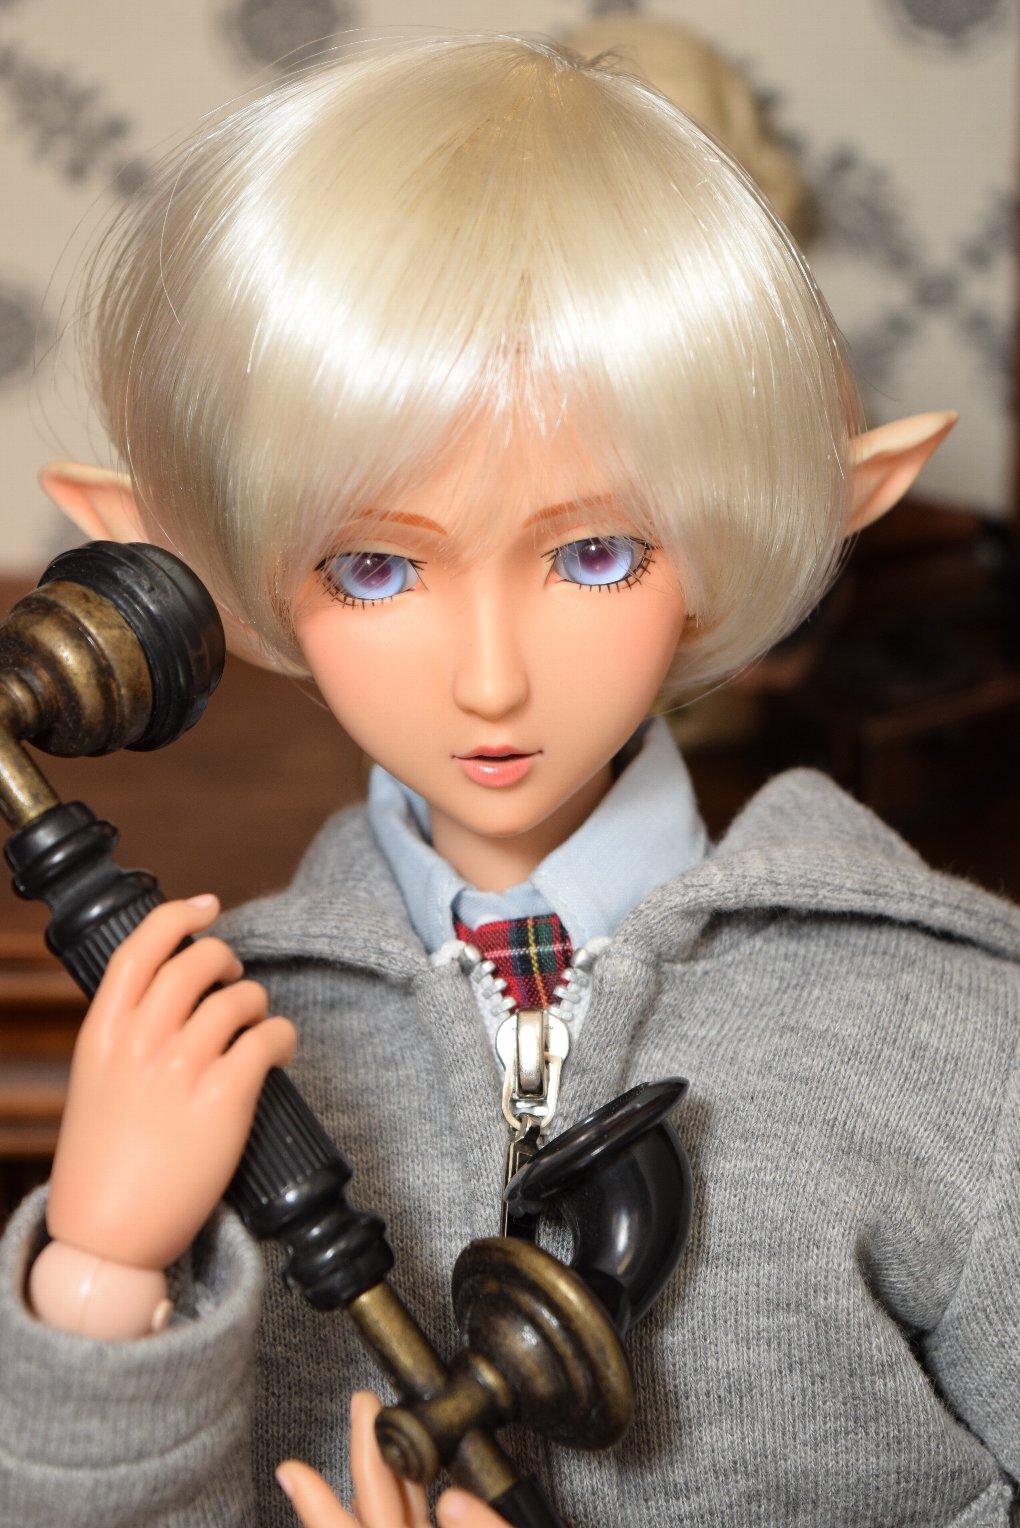 doll_4275.jpg